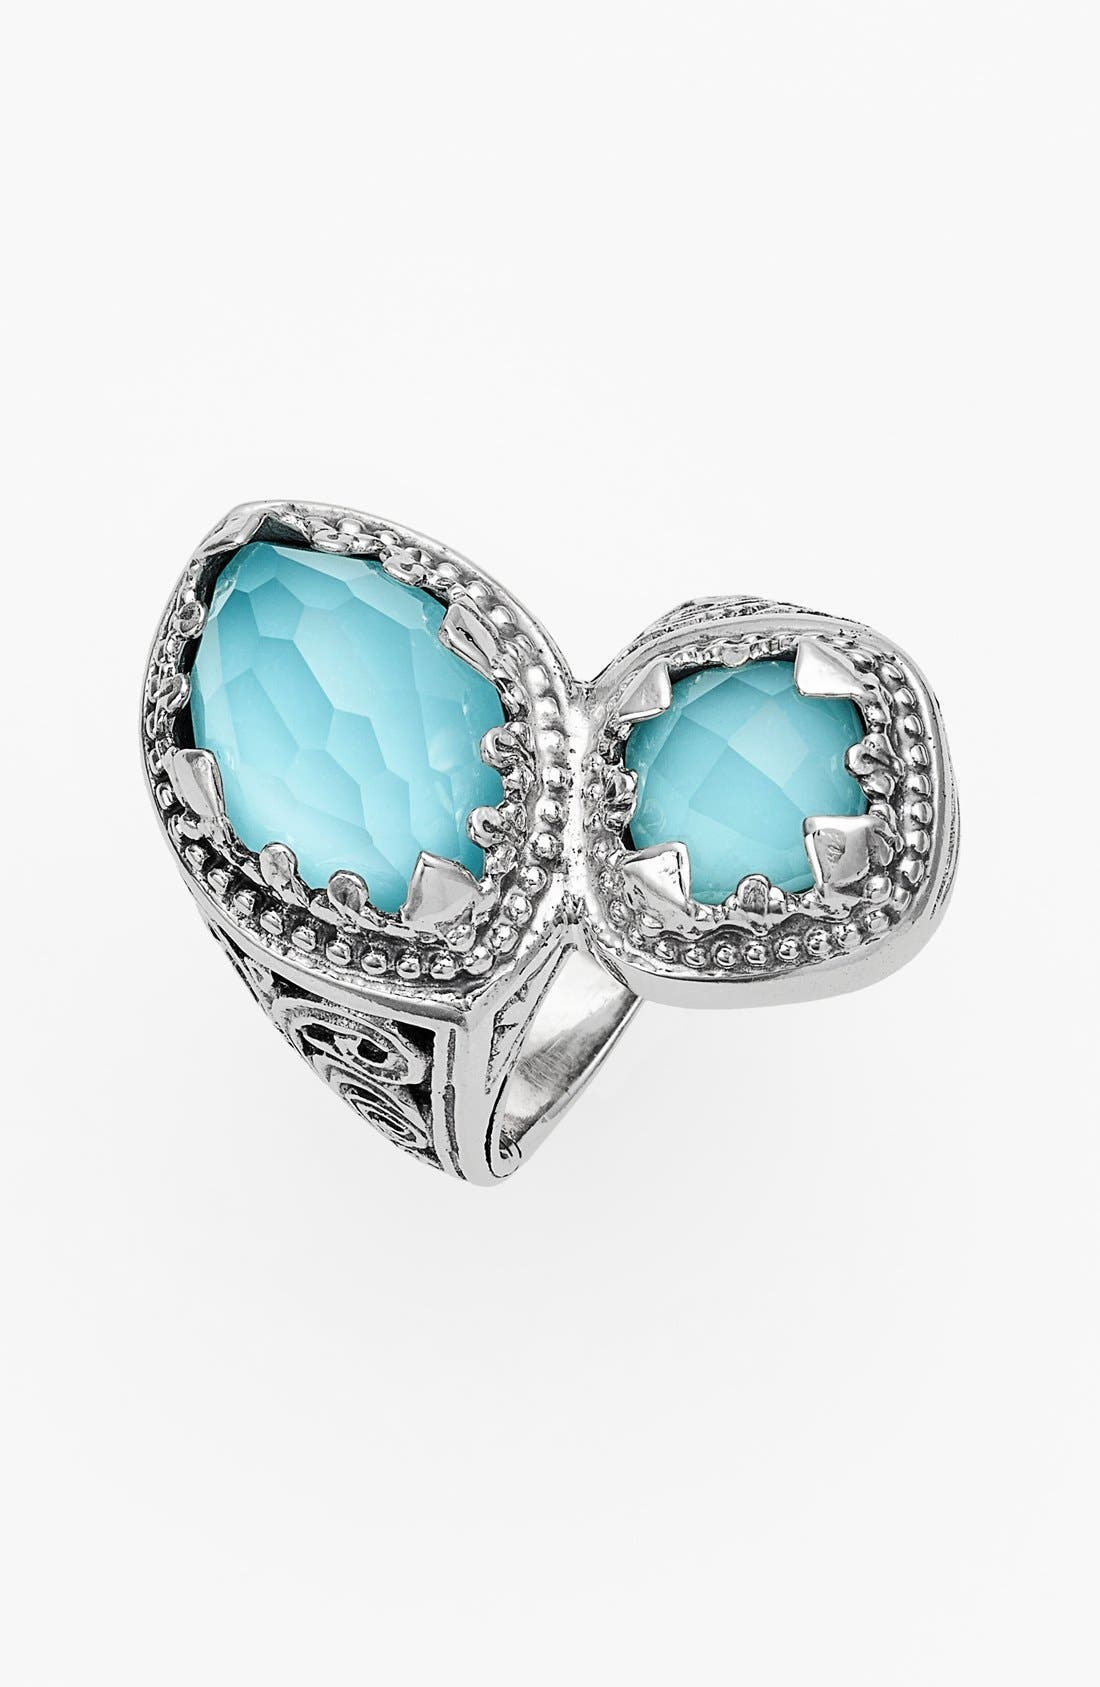 Alternate Image 1 Selected - Konstantino 'Aegean' Stone Ring